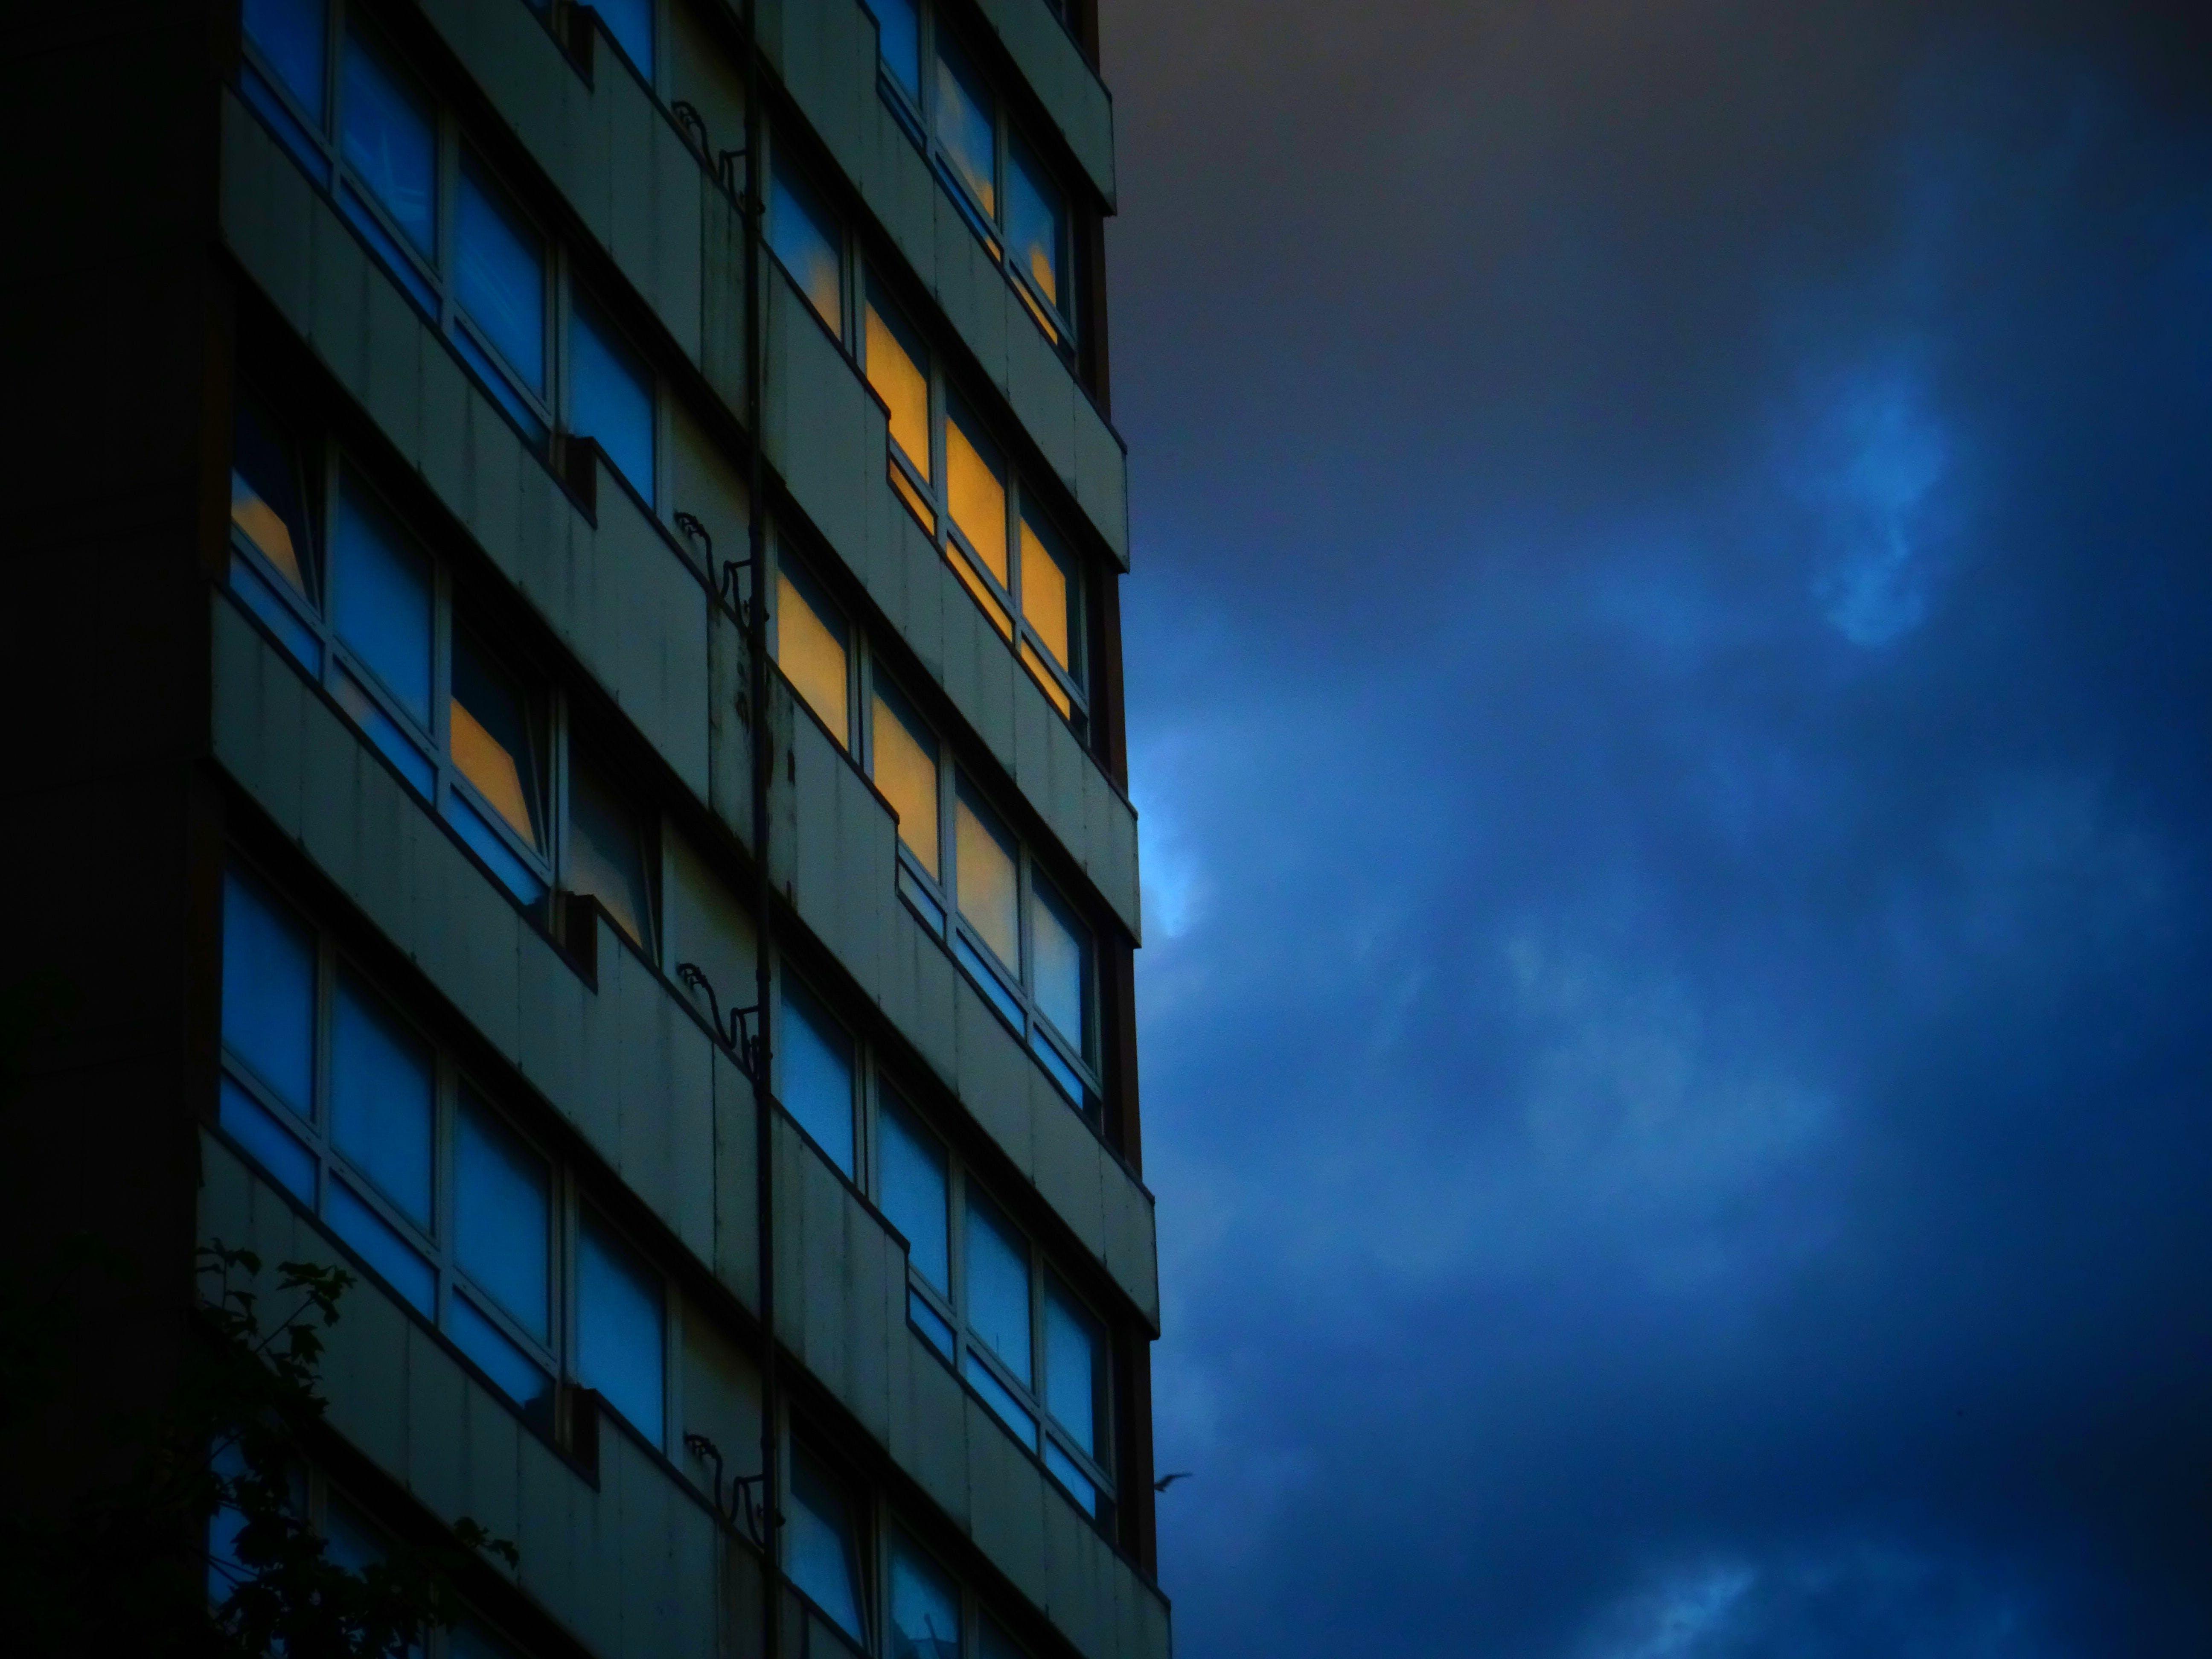 High-rise Building Under Blue Sky